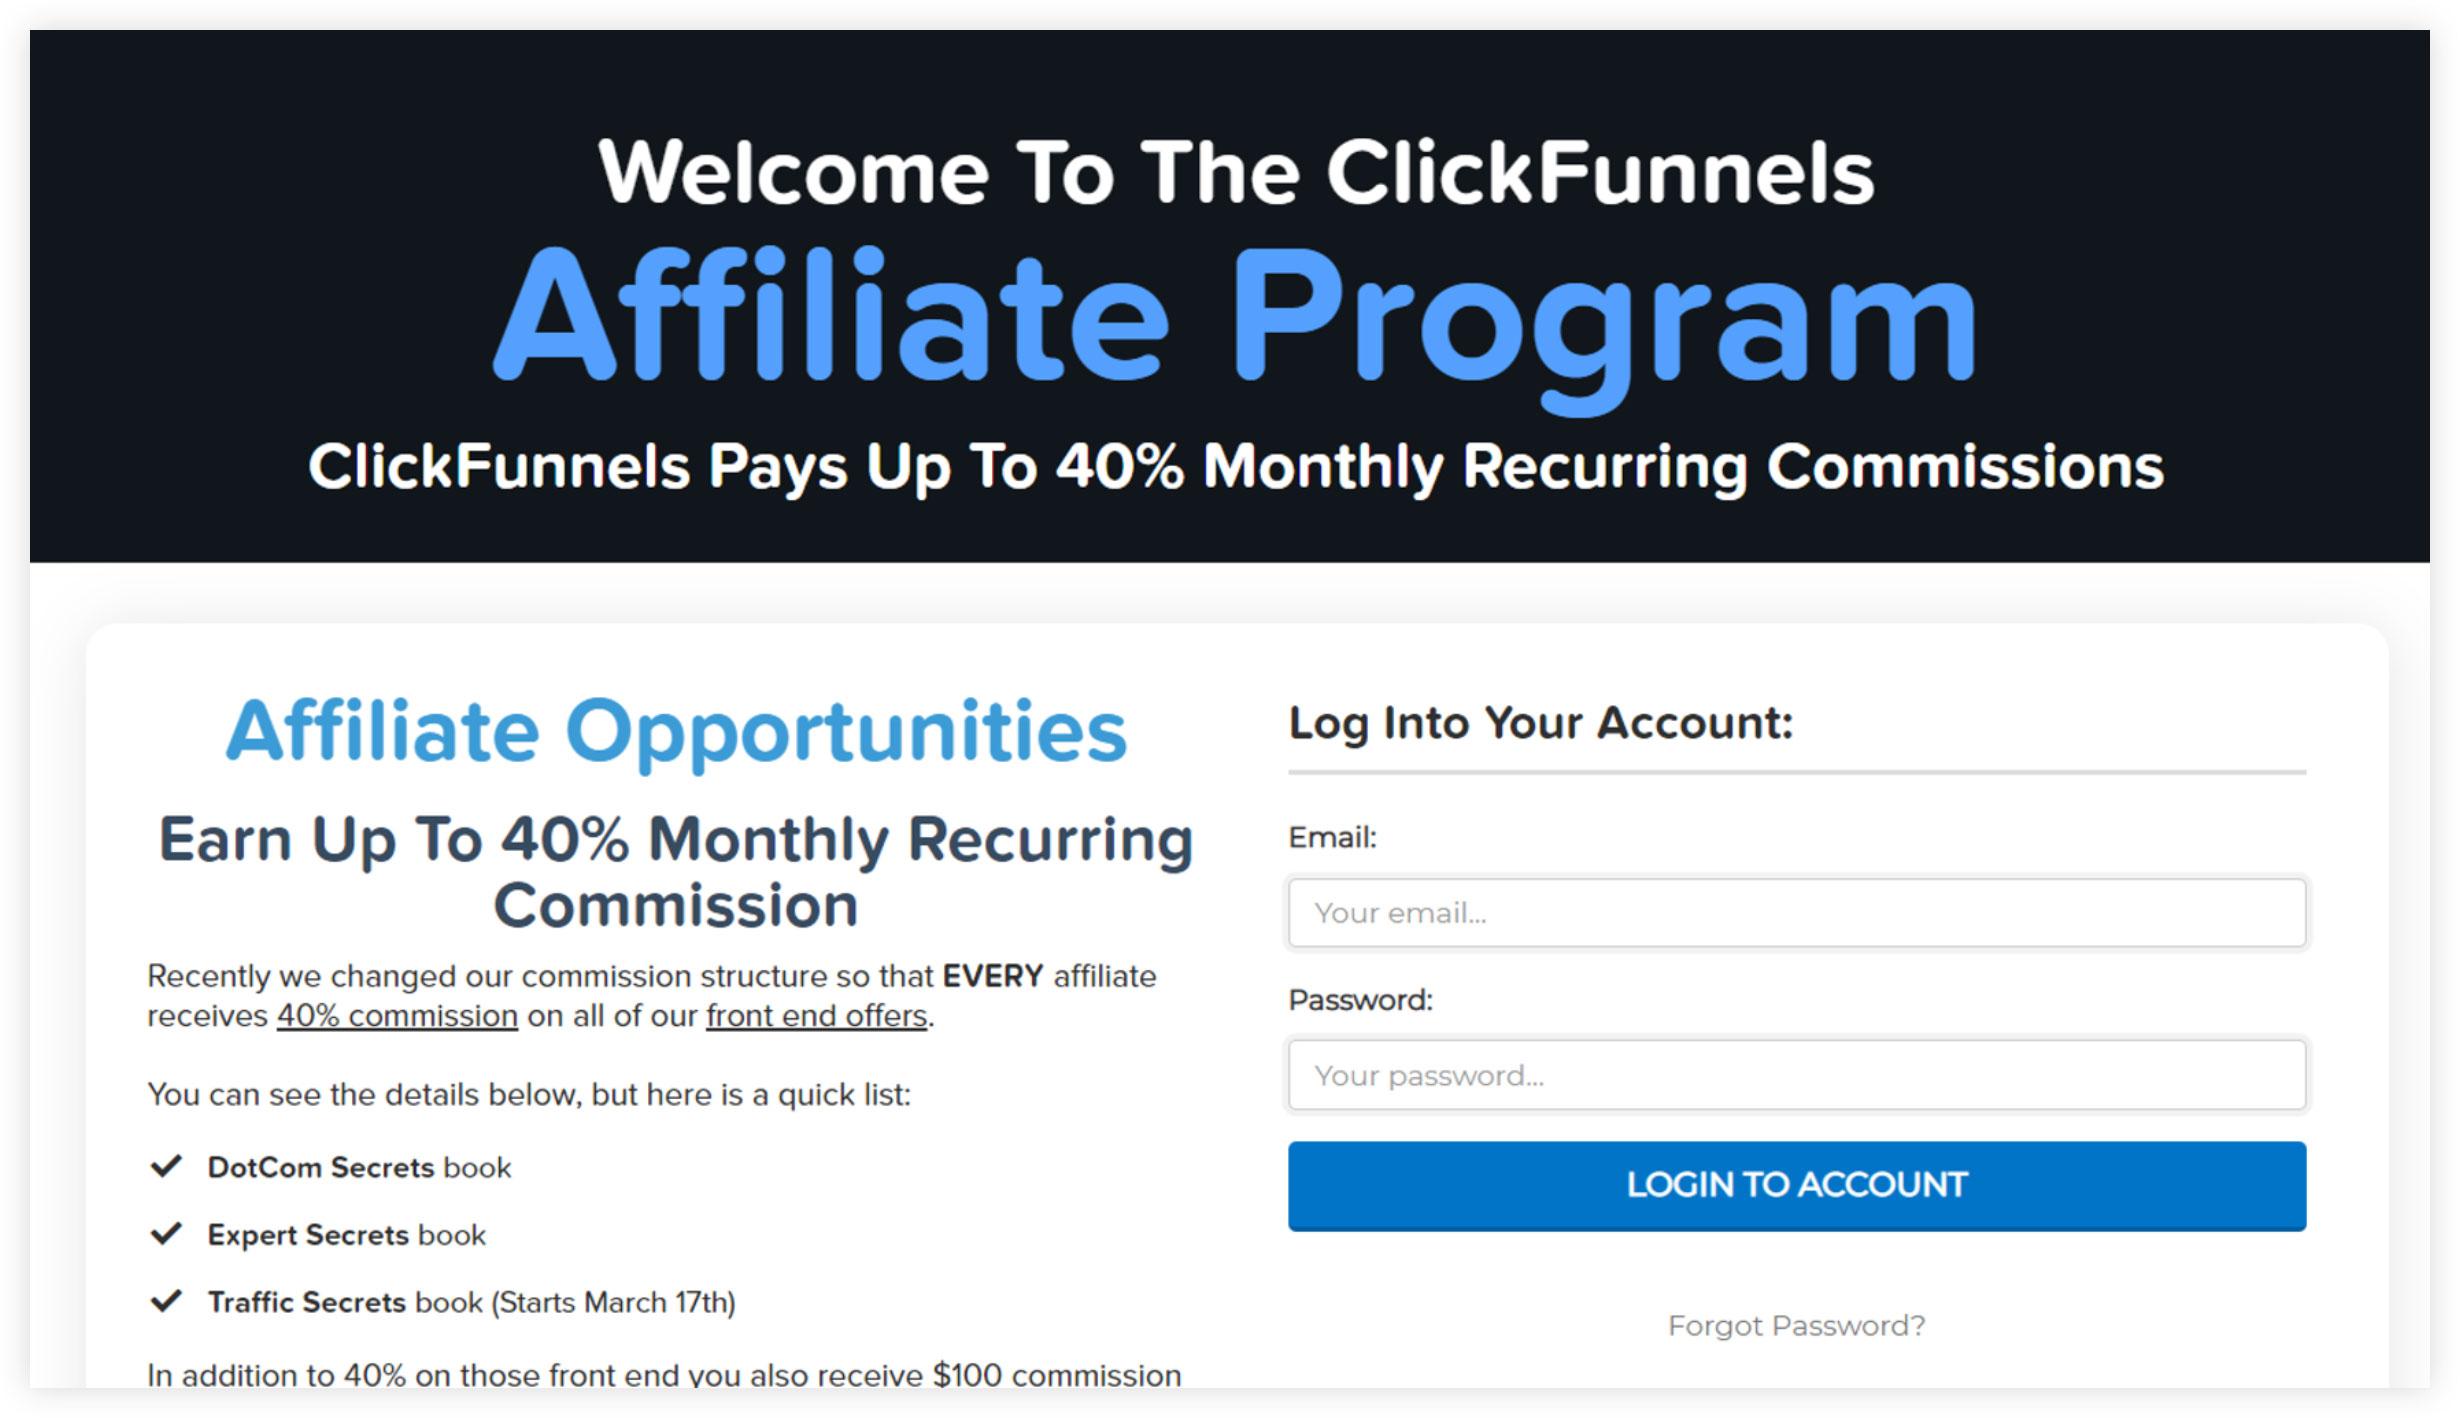 ClickFunnels Affiliate Progam Funnel Page